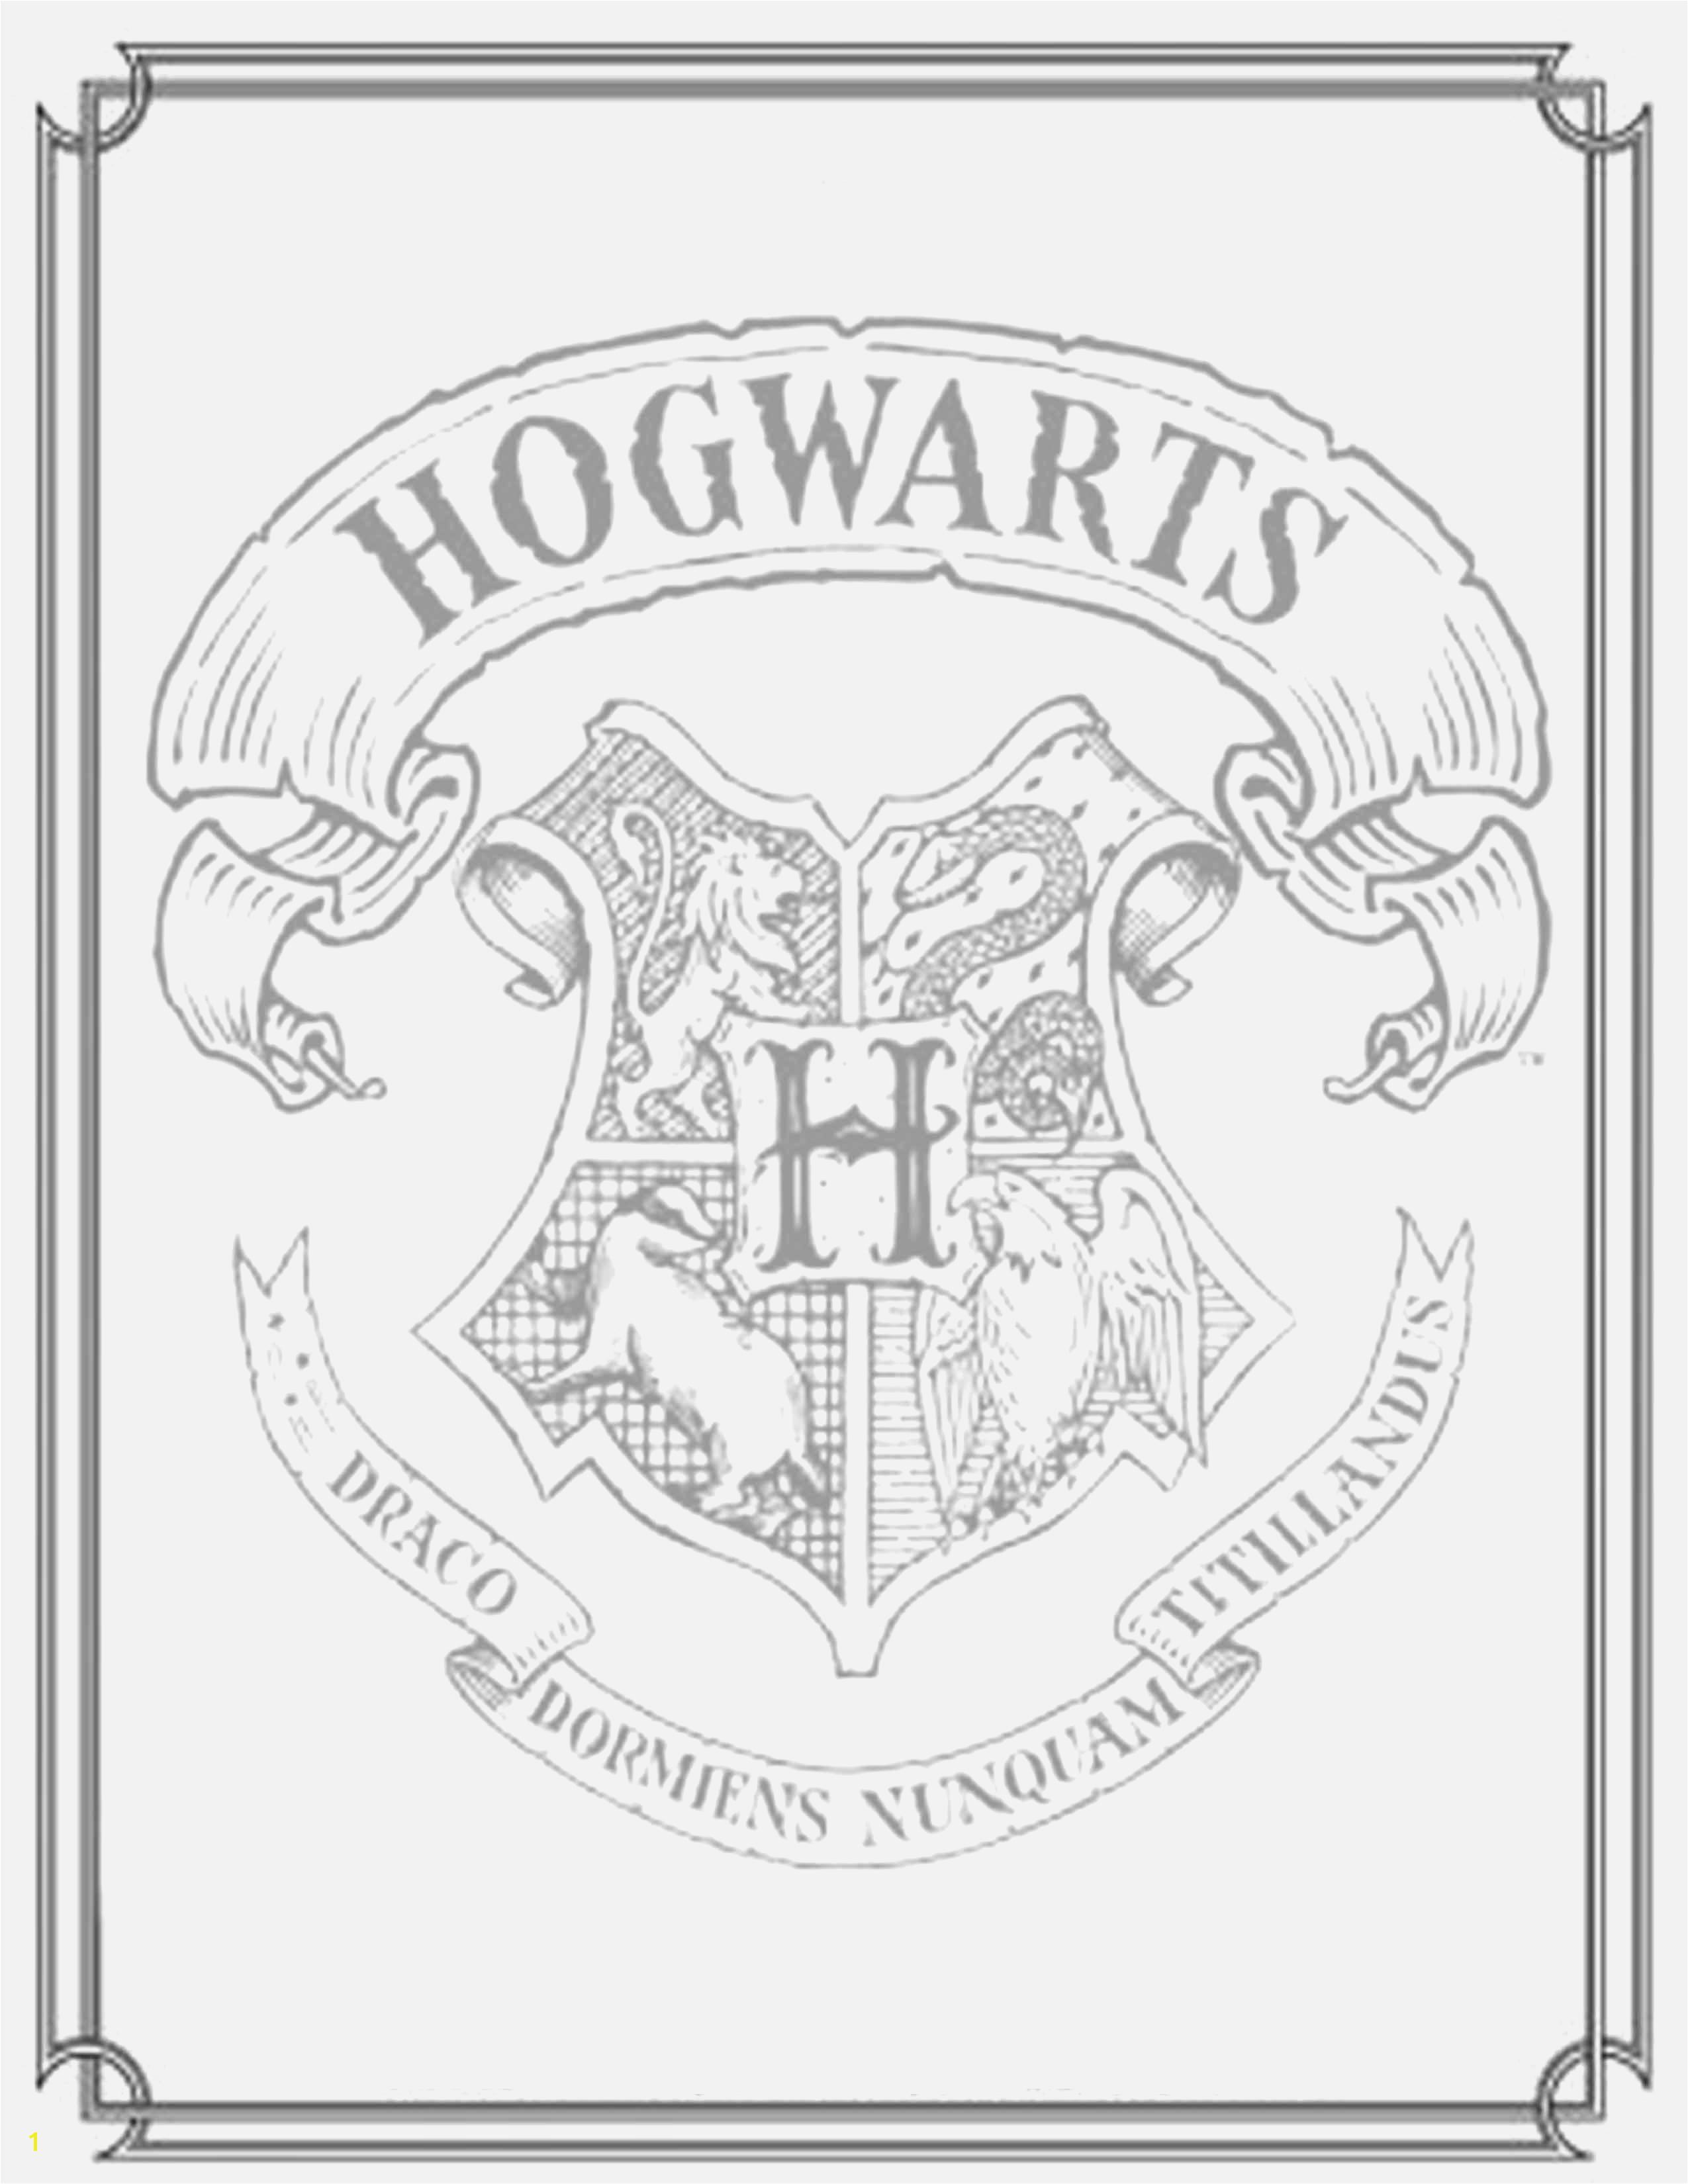 Harry Potter Malvorlagen Bildergalerie & Bilder Zum Ausmalen 50 Inspirational Harry Potter Coloring Page Buckbeak the